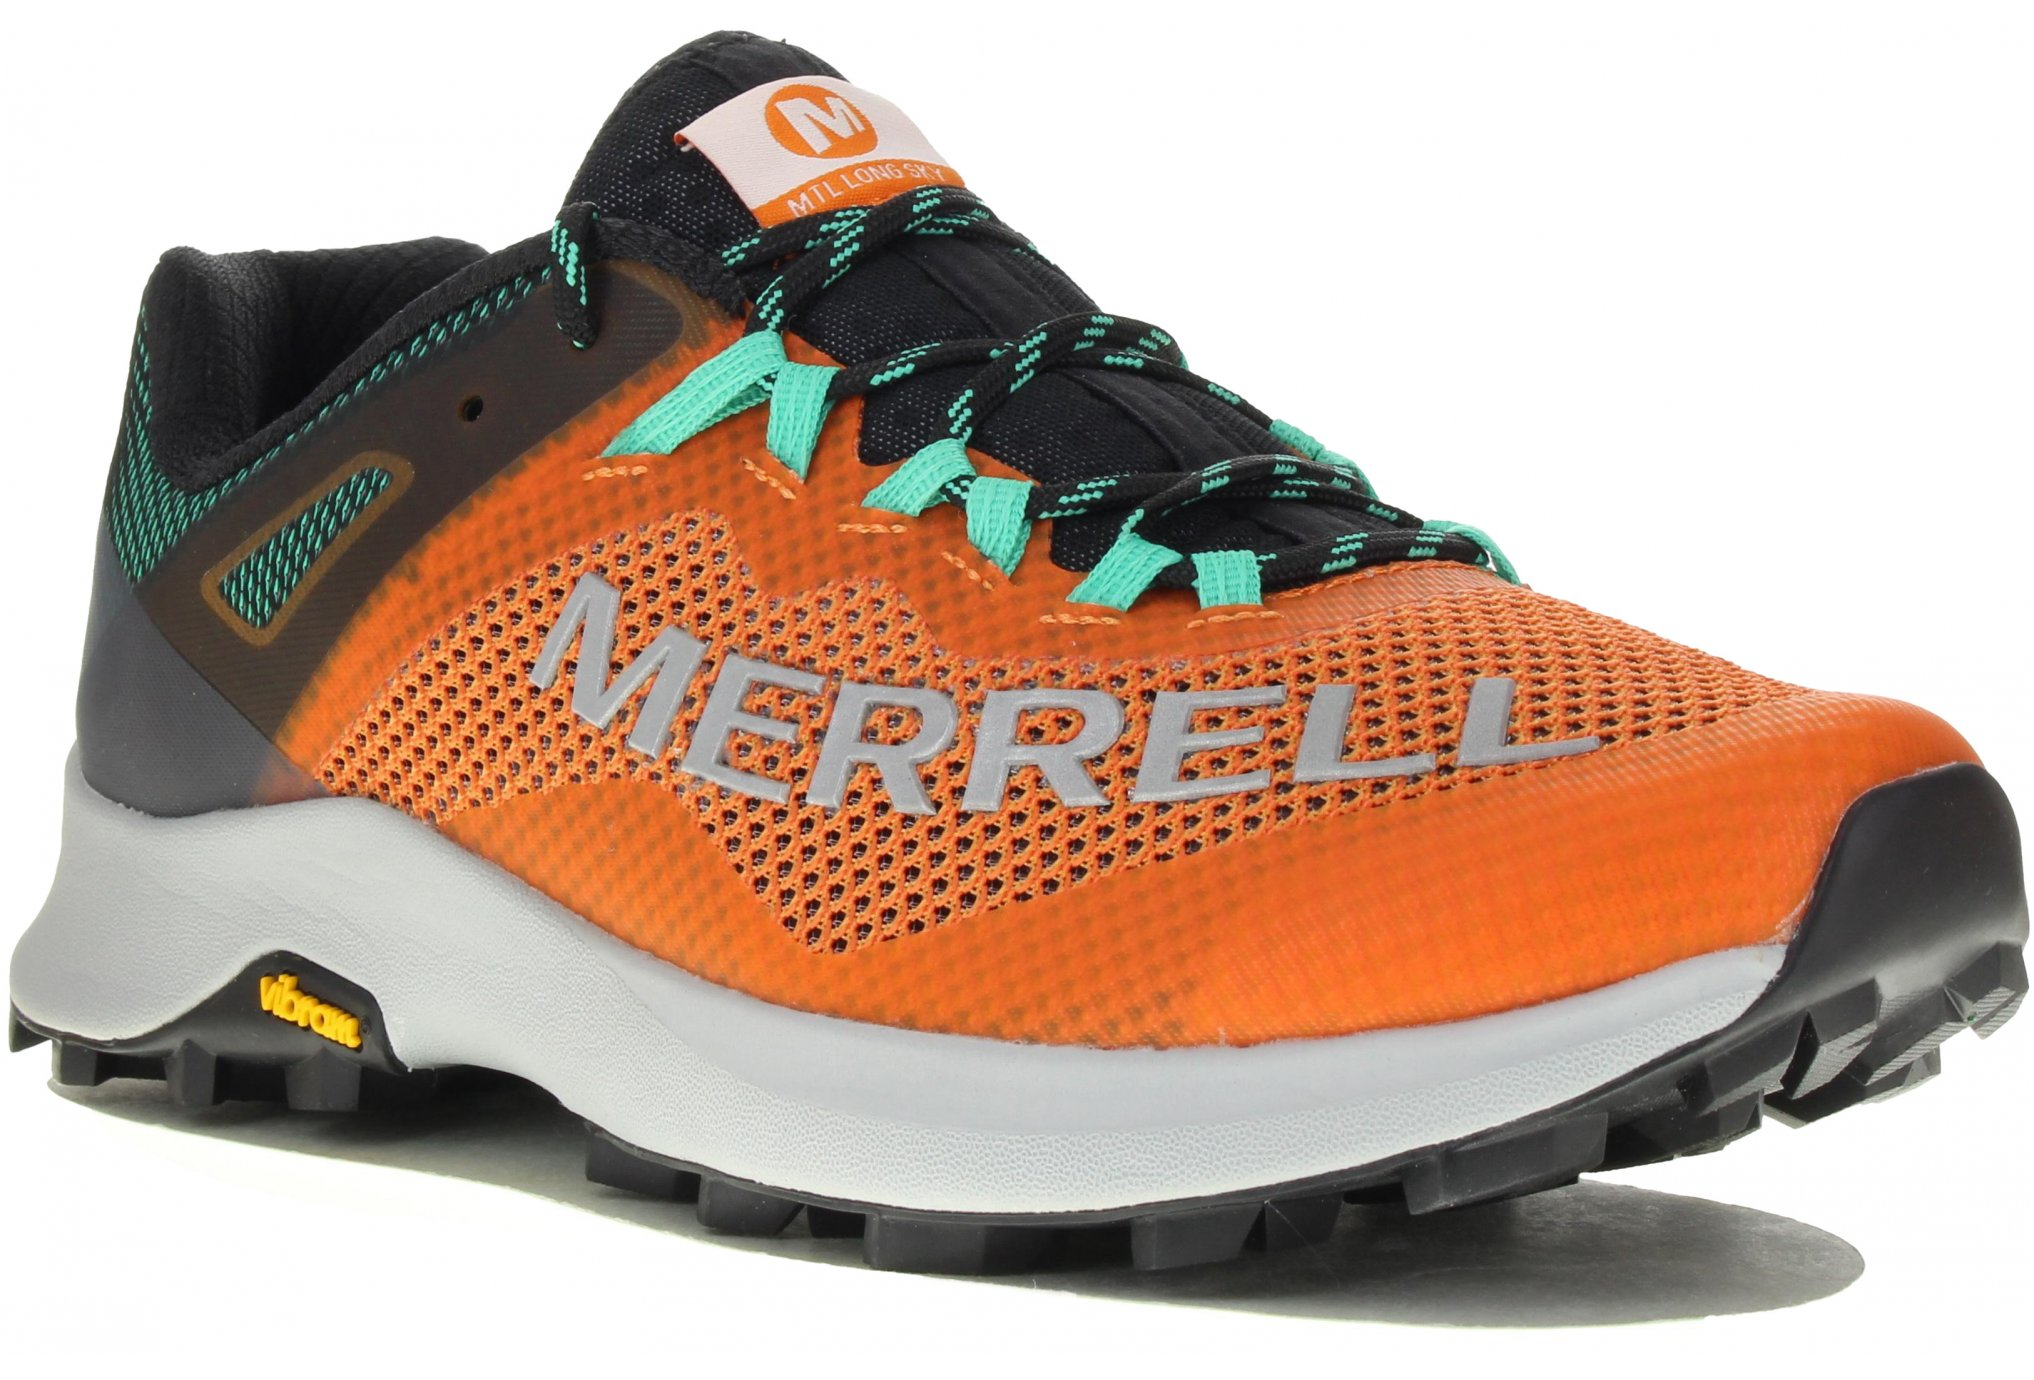 Merrell MTL Long Sky M Chaussures homme